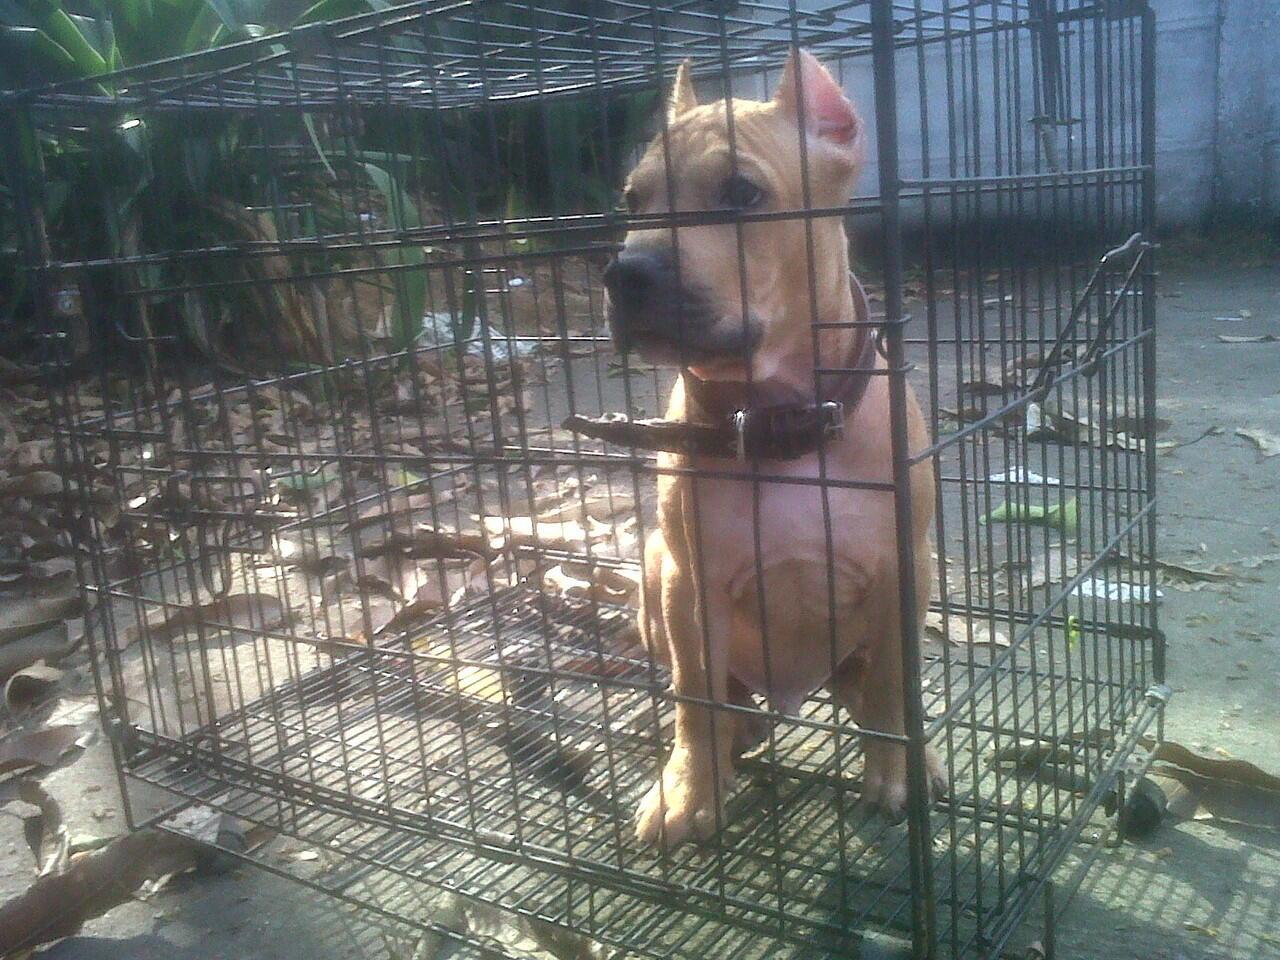 for sale anjing pitbull x bully top quality. bisa barter/TT dengan puppies rottweiler